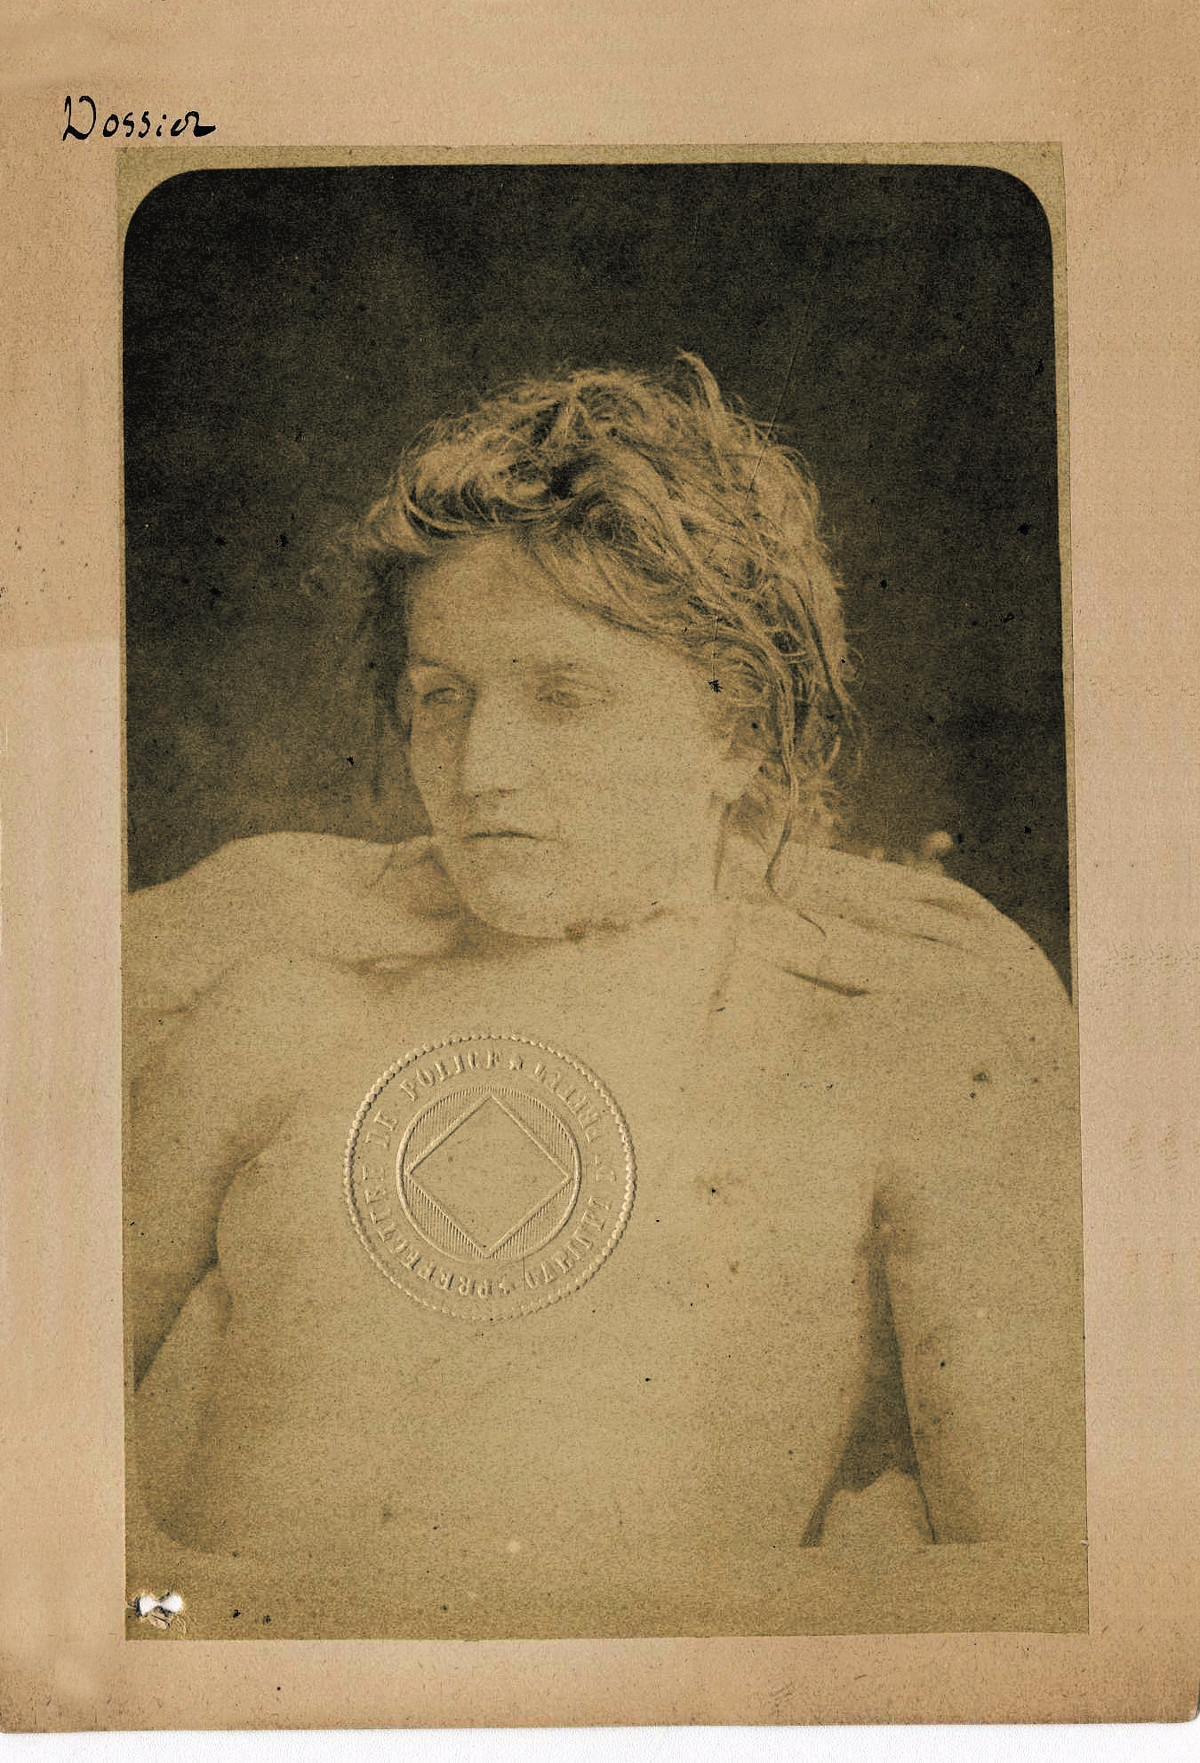 Clémentine Pichon, elegante vítima de assassinato, entre dois sonhos na mesa de autópsia.